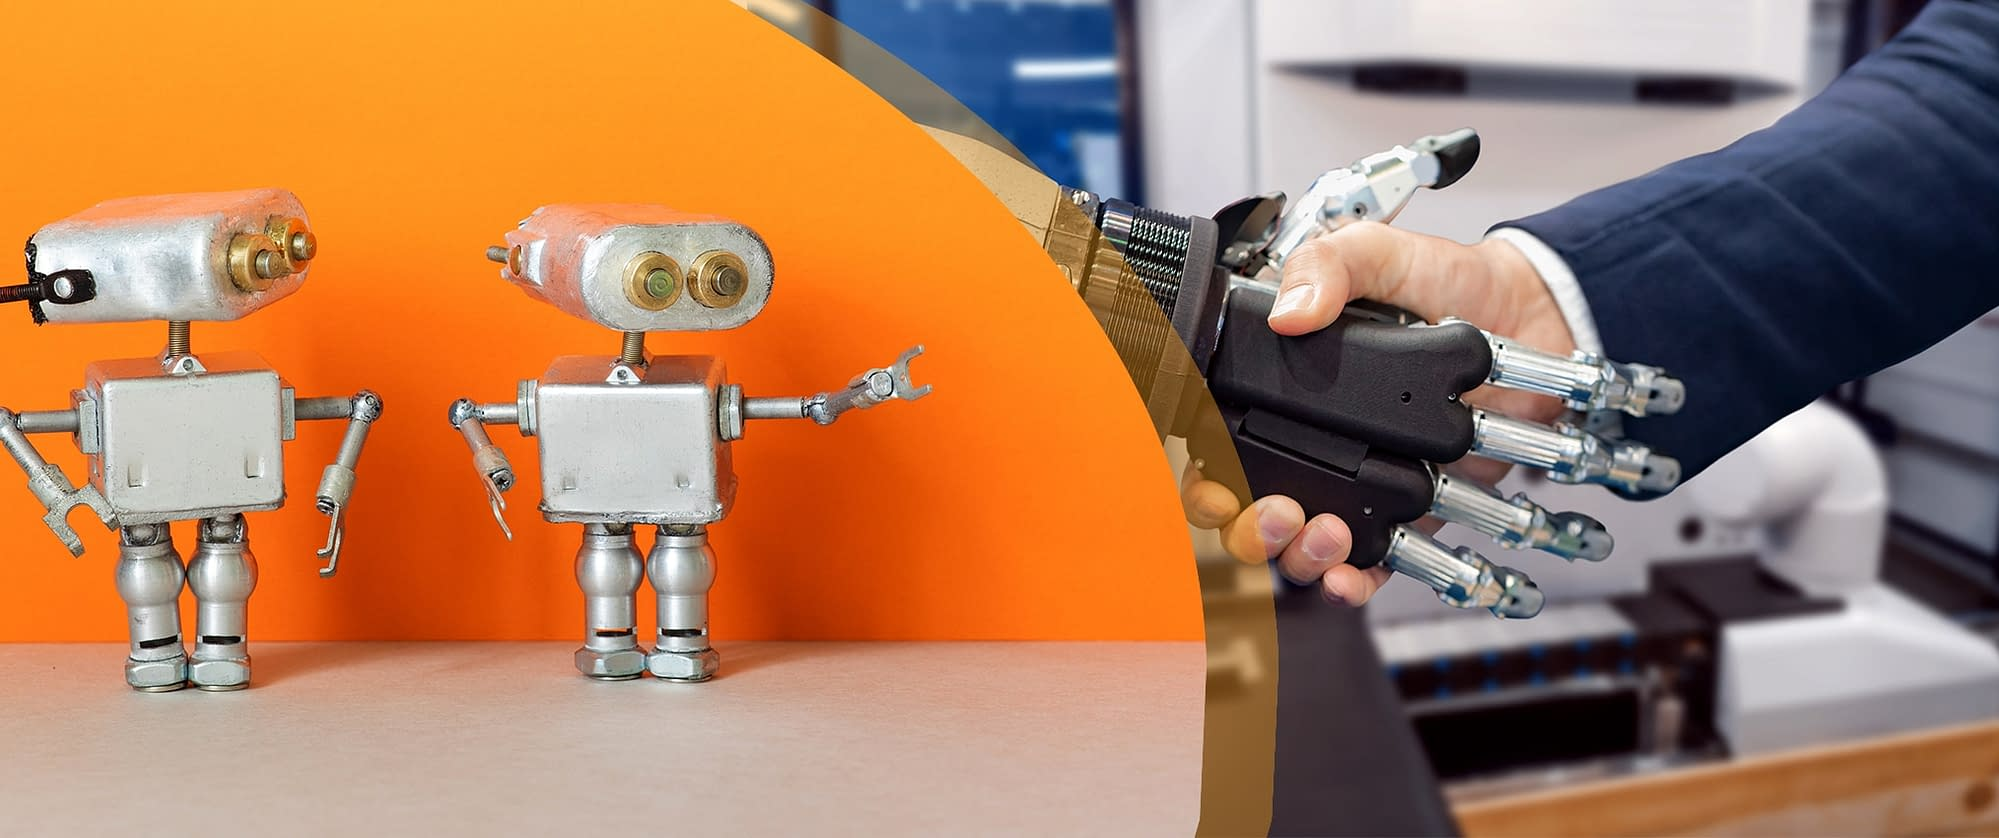 Soft robots sense Human Touch